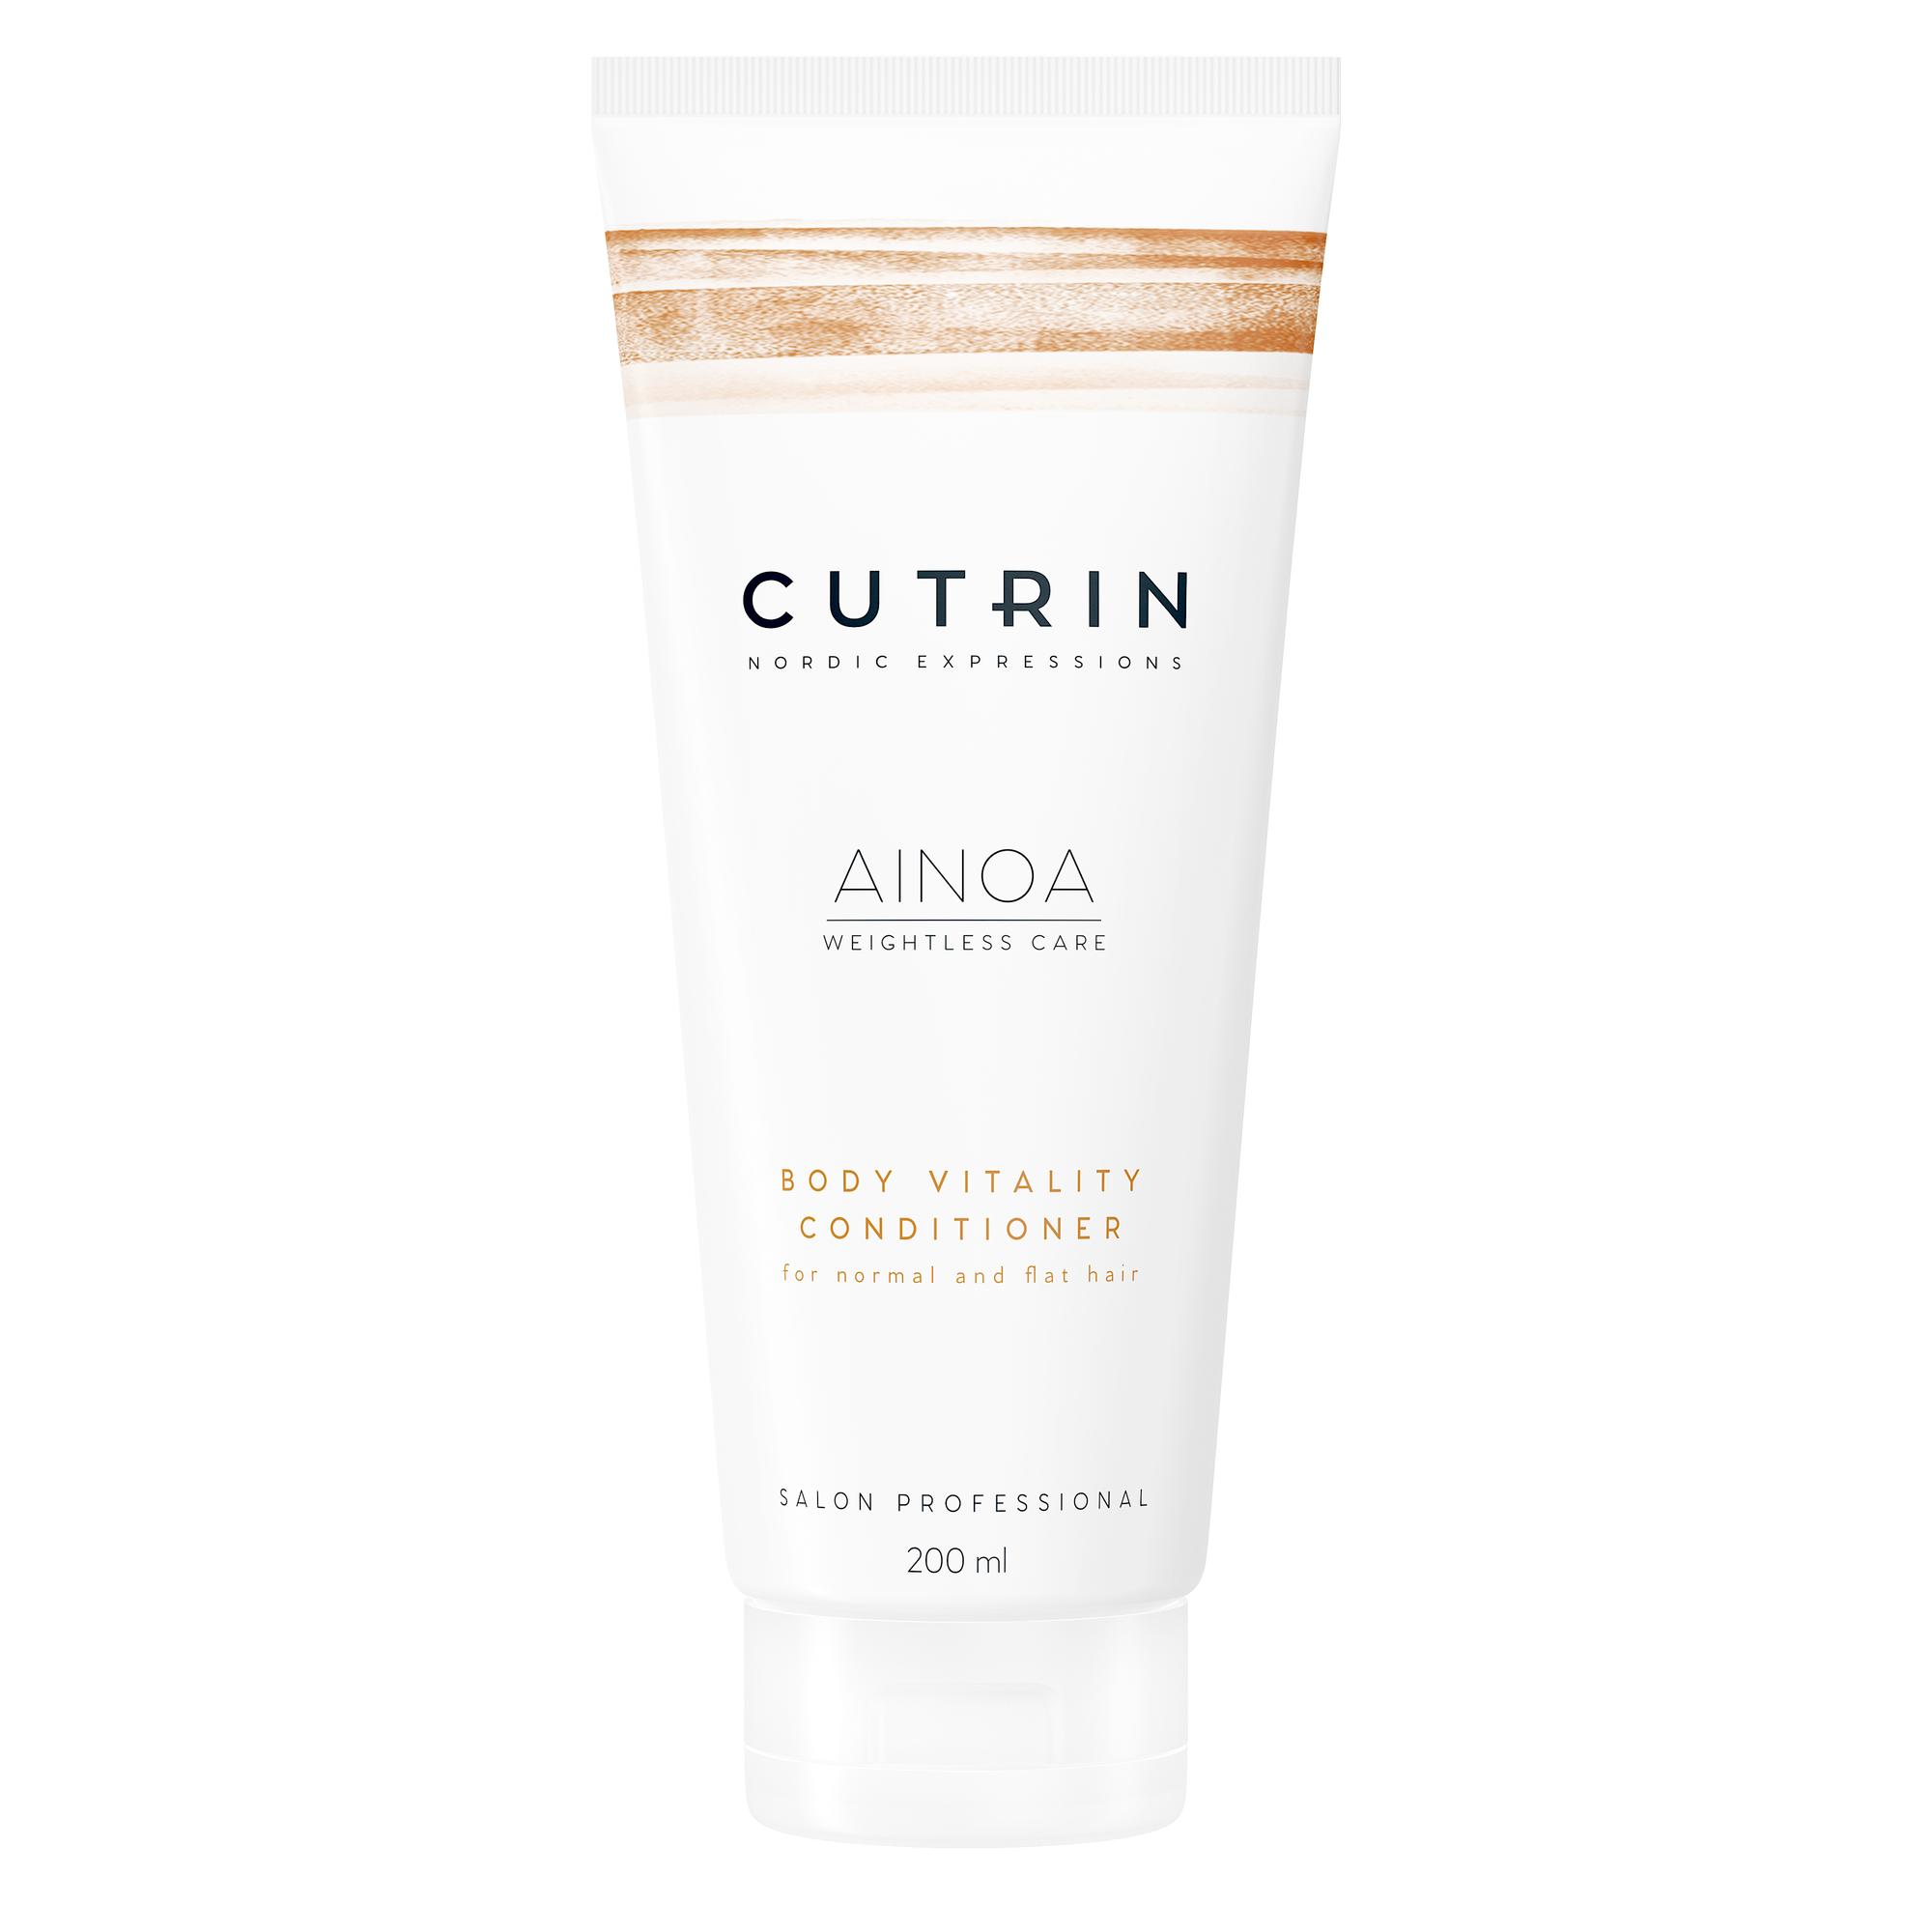 CUTRIN Кондиционер для укрепления волос / AINOA BODY VITALITY 200 мл.